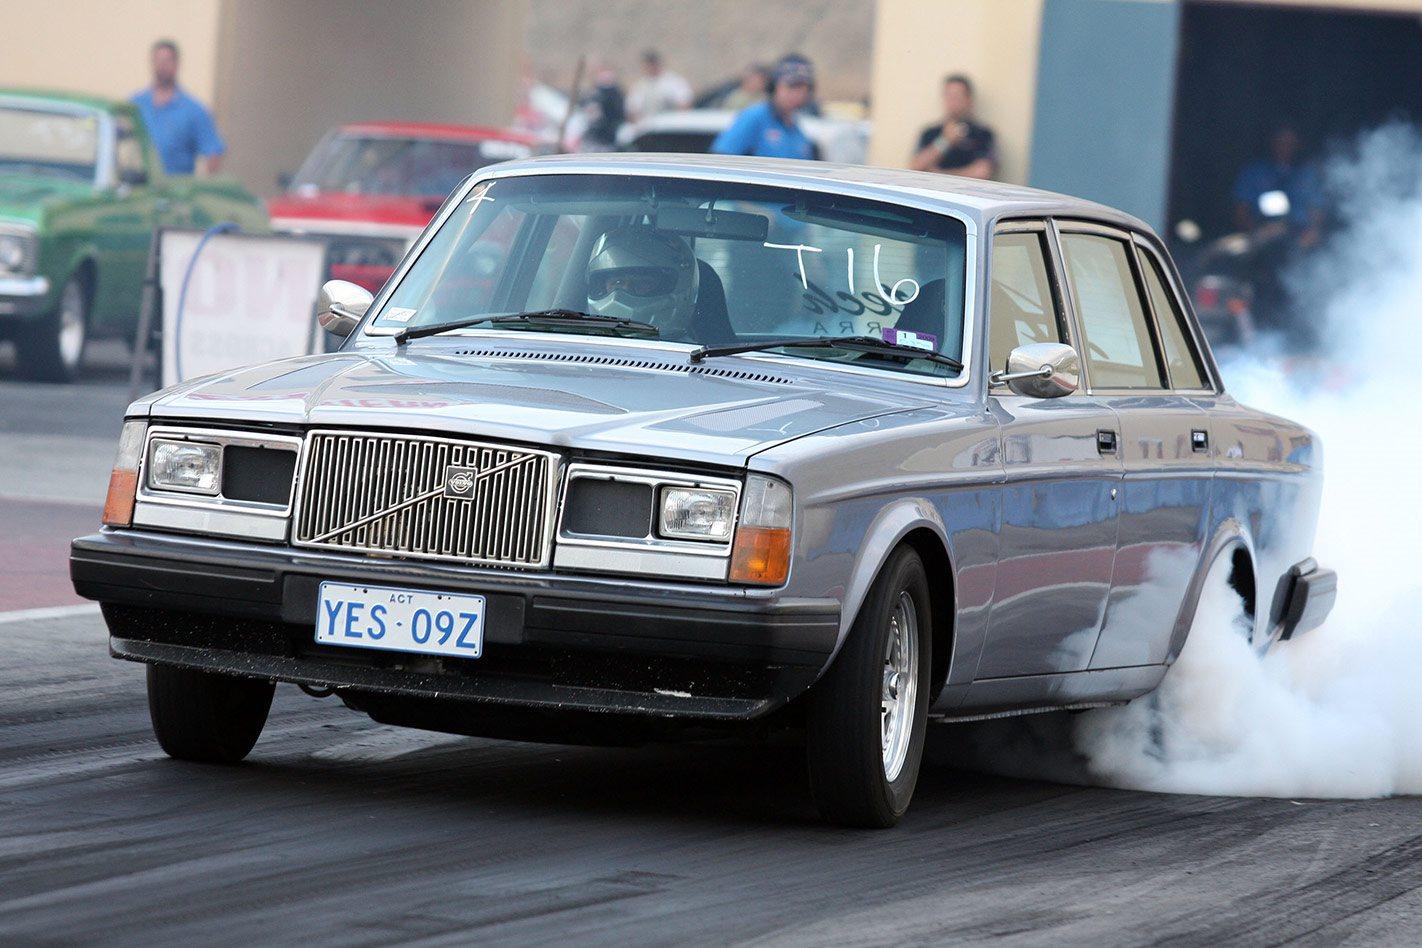 RANGE ROVER TWIN-TURBO V8-POWERED 1976 VOLVO 264